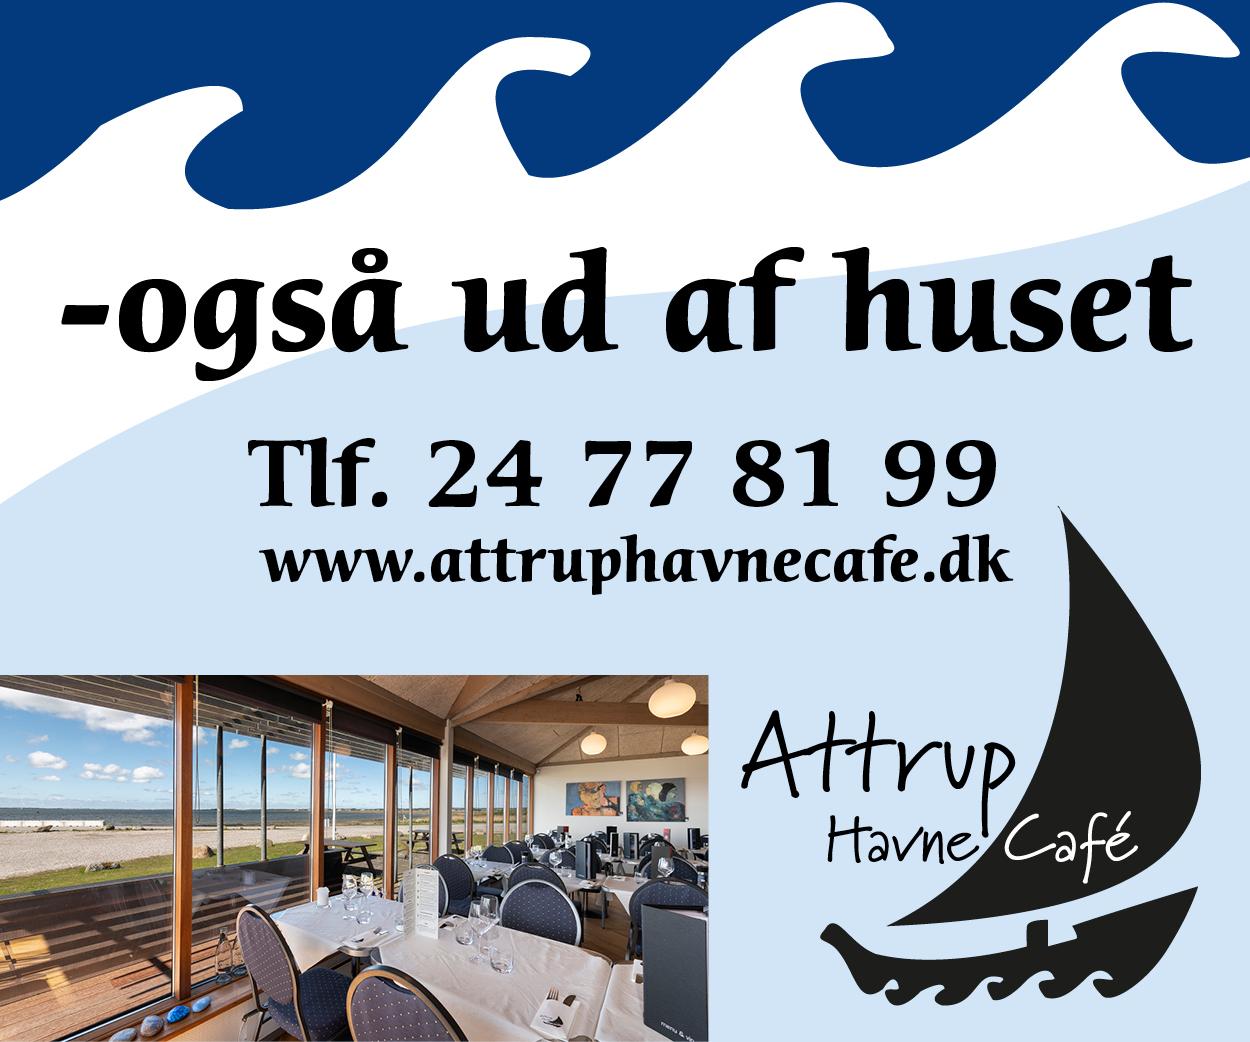 Attrup Havne Café 3